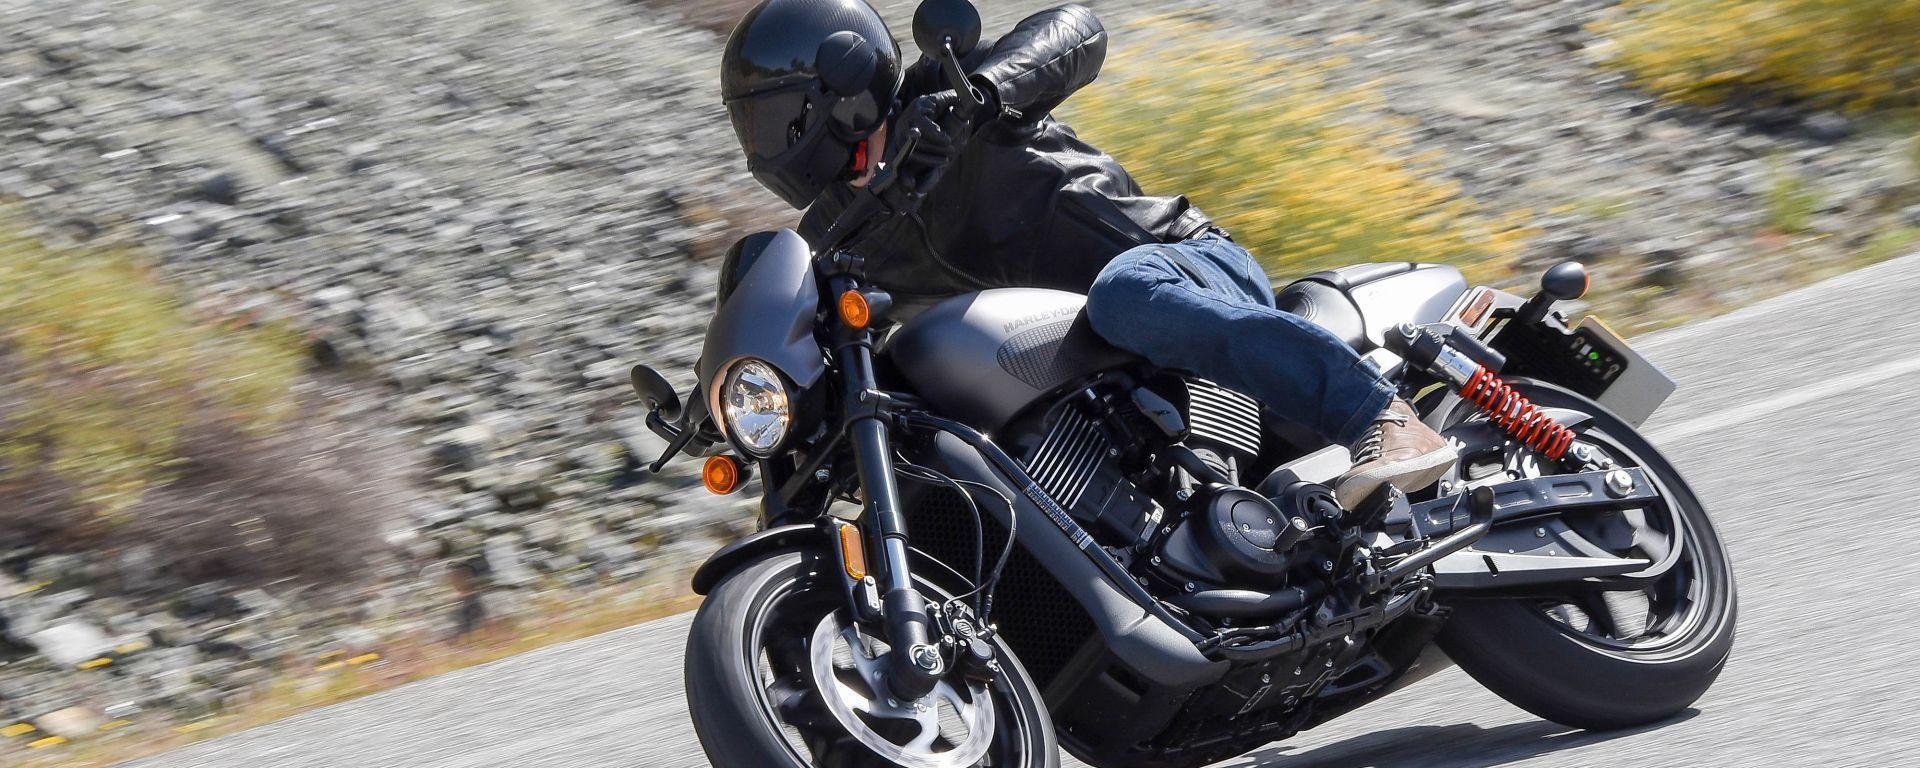 Harley-Davidson Street Rod 750, su strada diverte ma non impensierisce